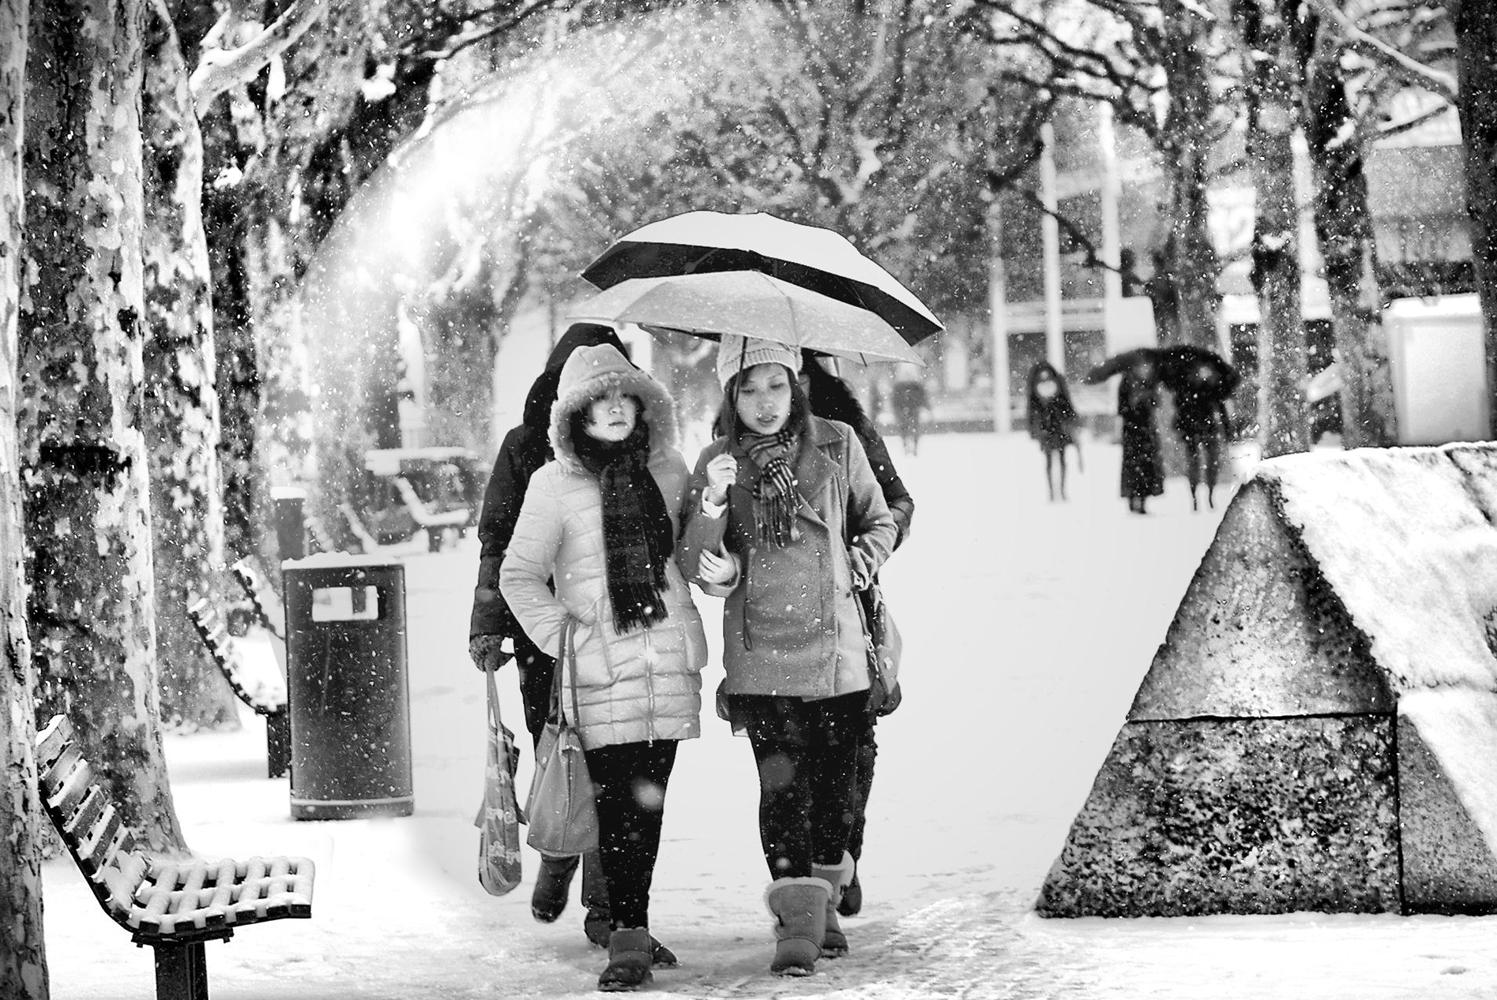 Madiha_Abdo_09London Snowy Day